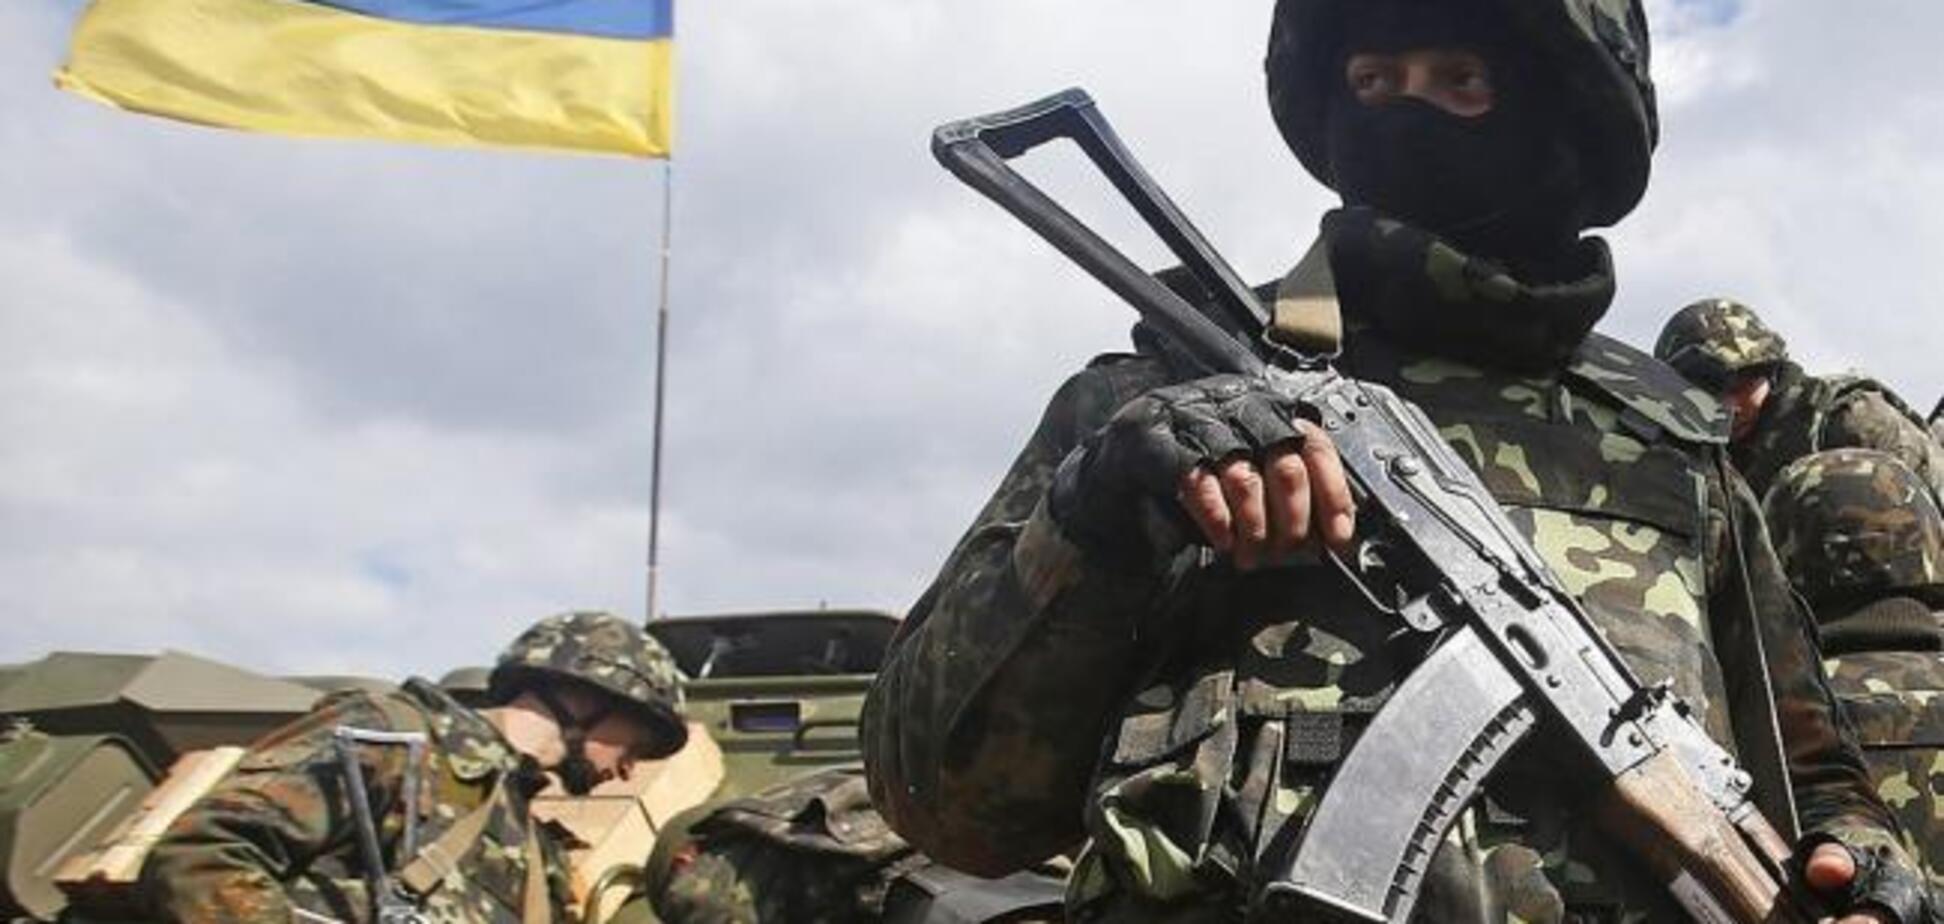 'Л/ДНР' накрили вогнем ЗСУ на Донбасі: Україна вистояла